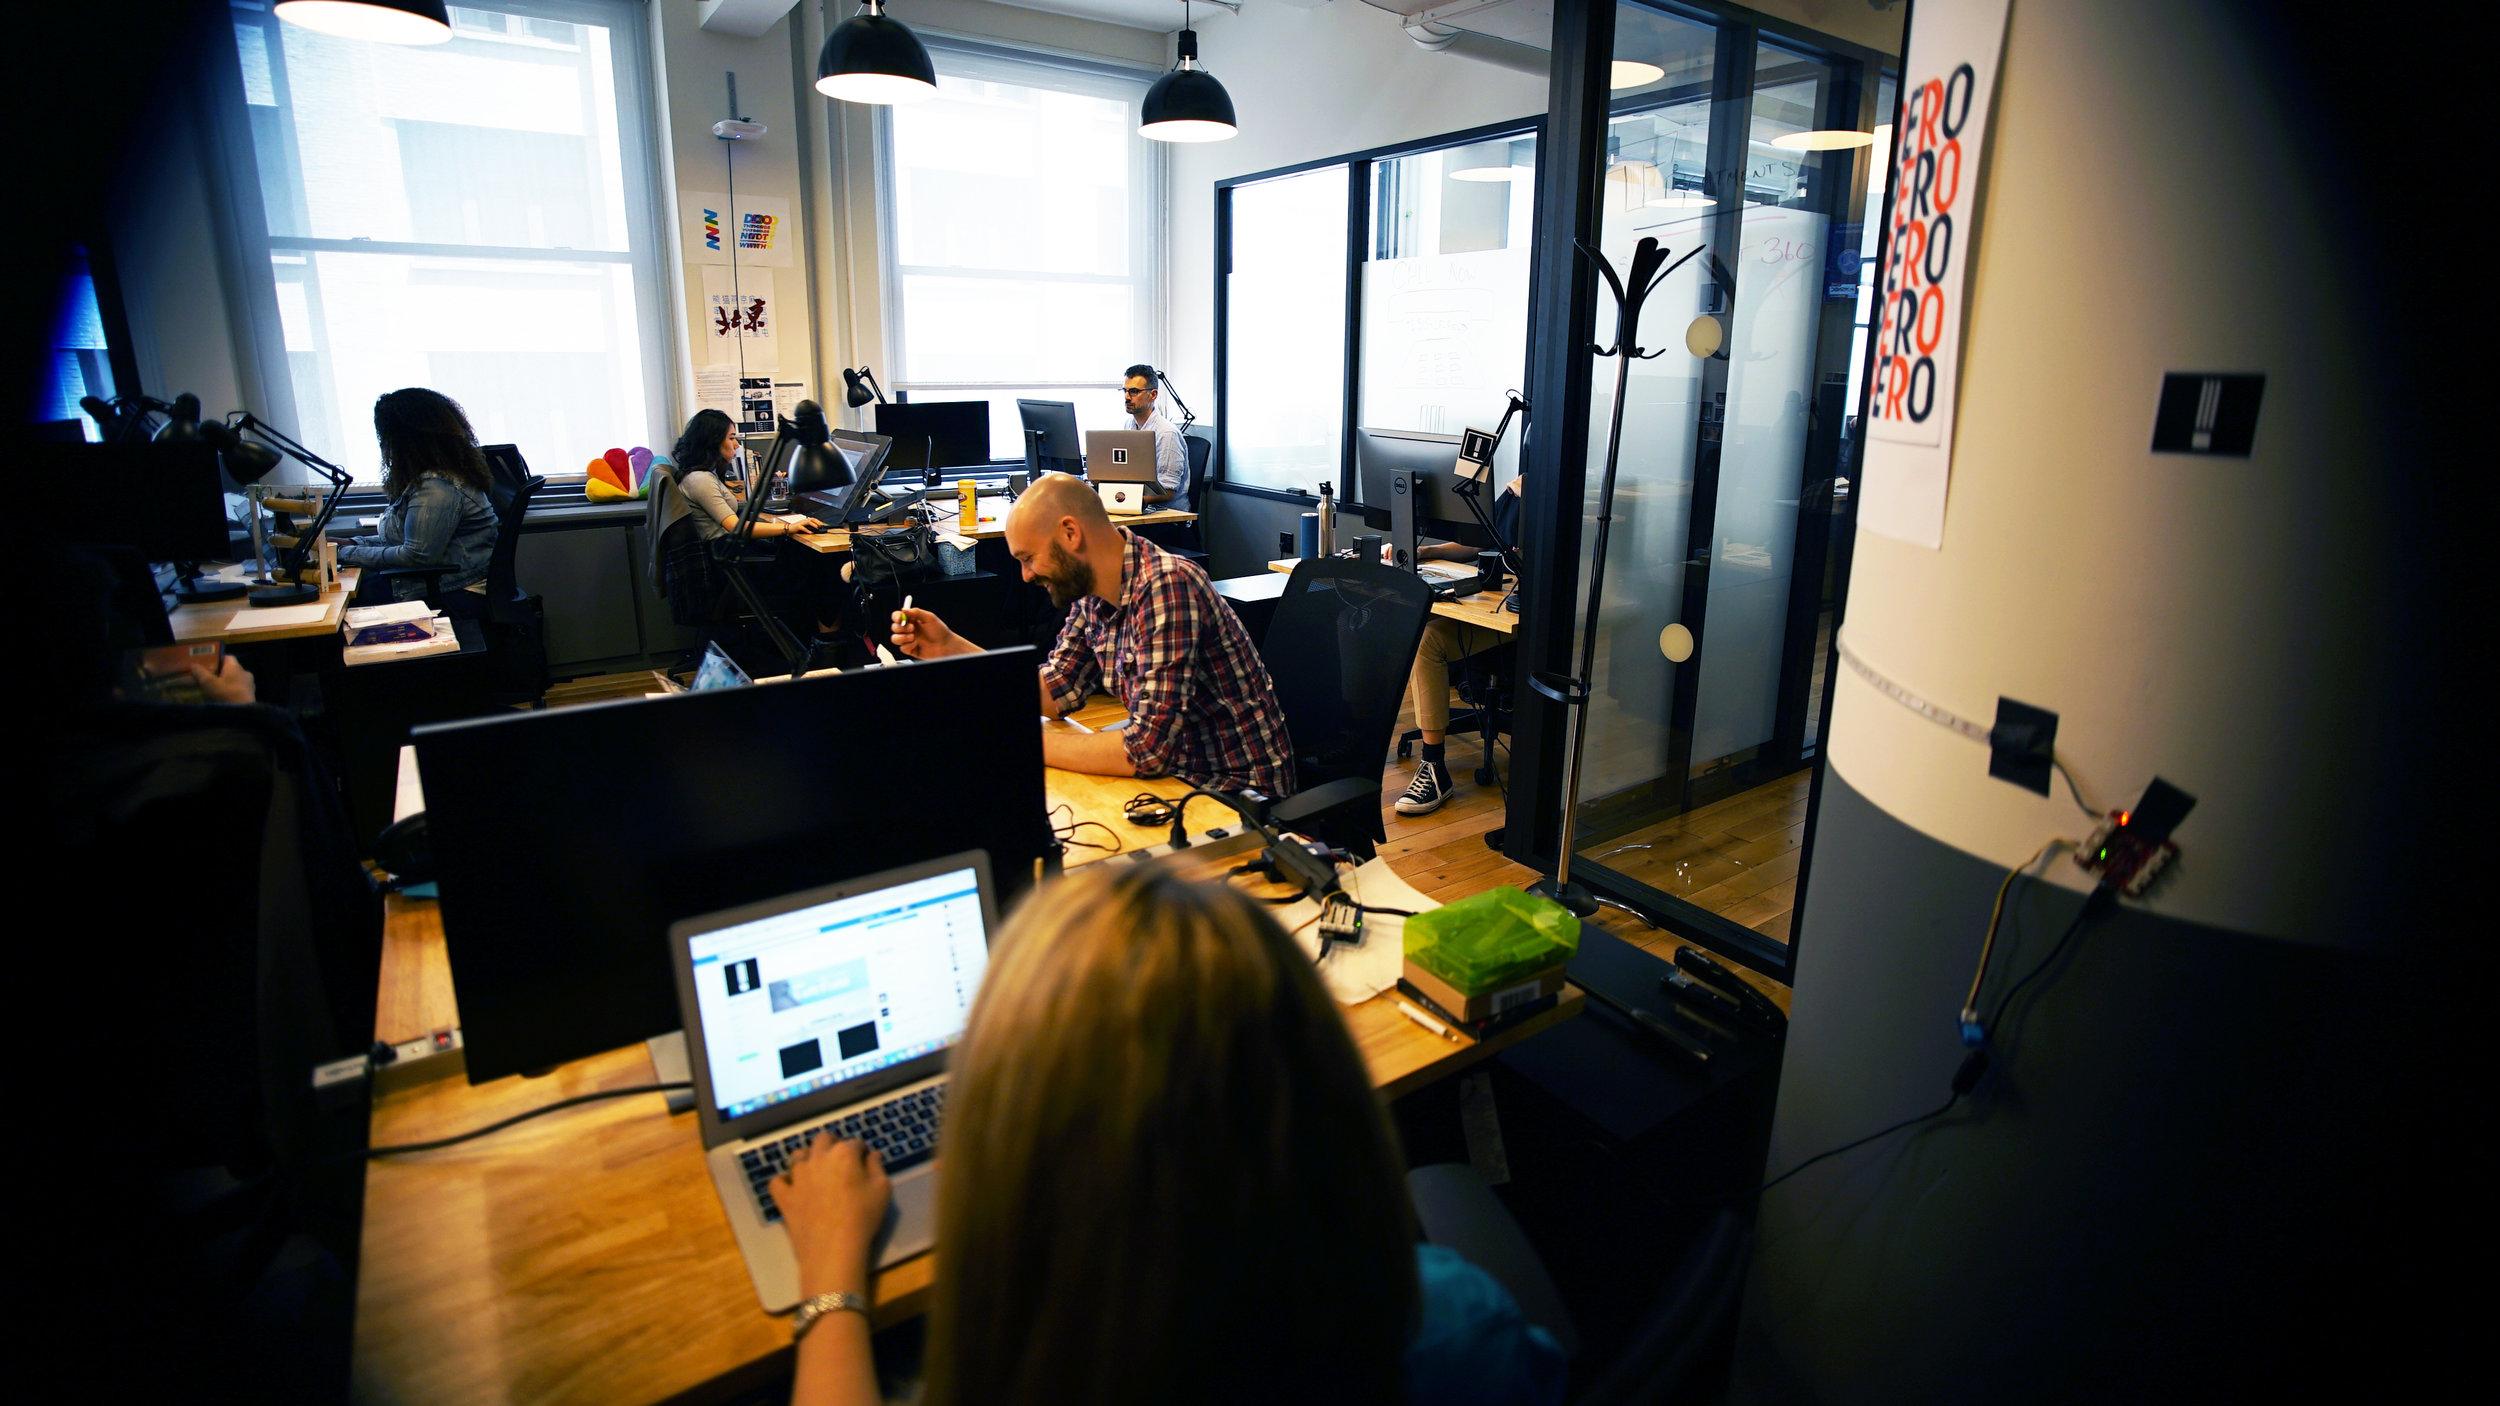 lf office.jpg